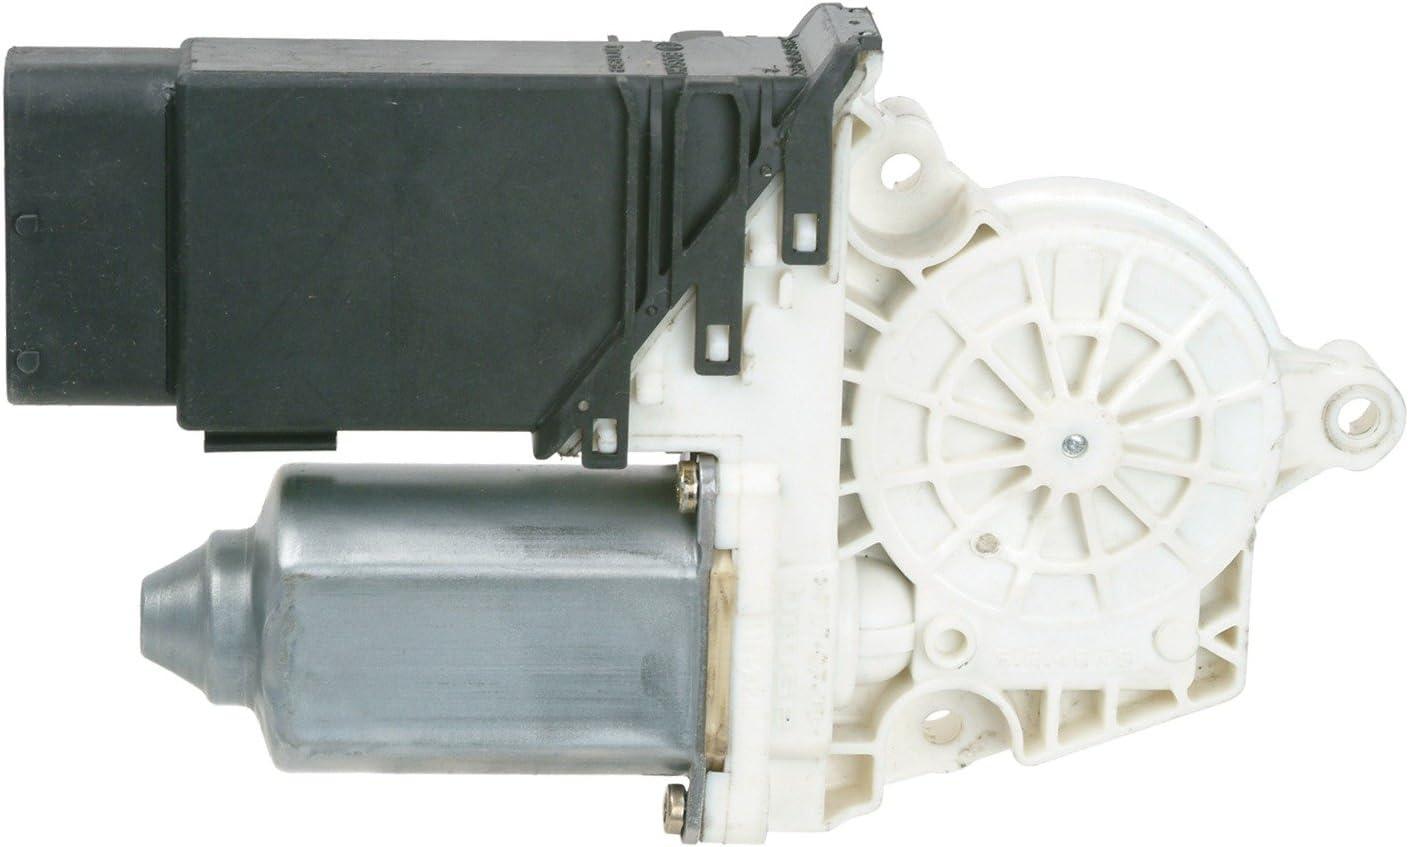 Cardone 47-2038 Remanufactured Import Window Lift Motor